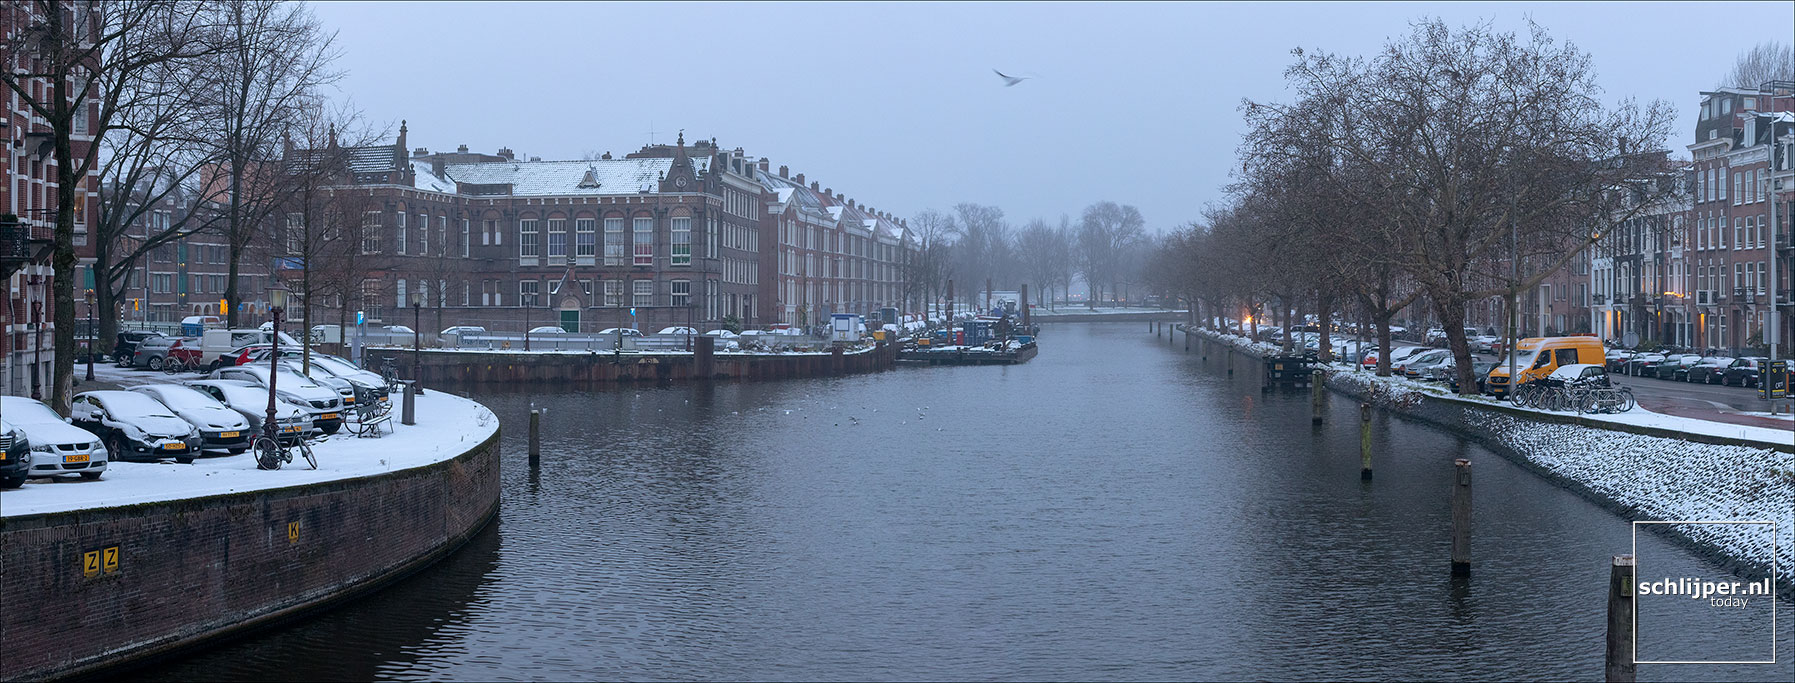 Nederland, Amsterdam, 16 december 2018